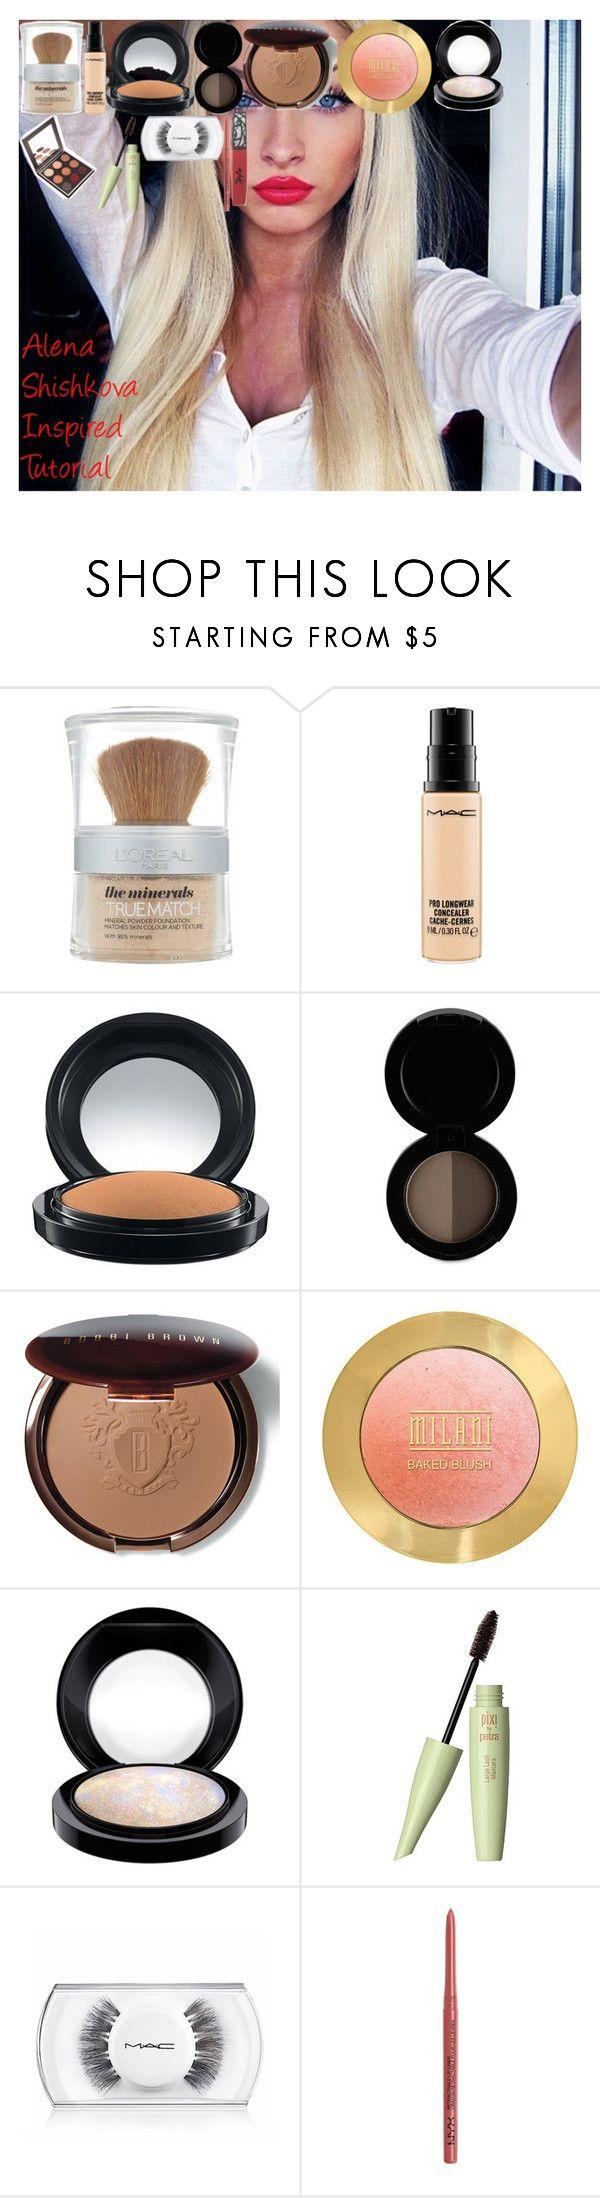 Alena Shishkova Inspired Tutorial by oroartye-1 on Polyvore featuring beauty, Bobbi Brown Cosmetics, MAC Cosmetics, Pixi, L'Oréal Paris, Sigma, The Lip Bar, NYX and 48